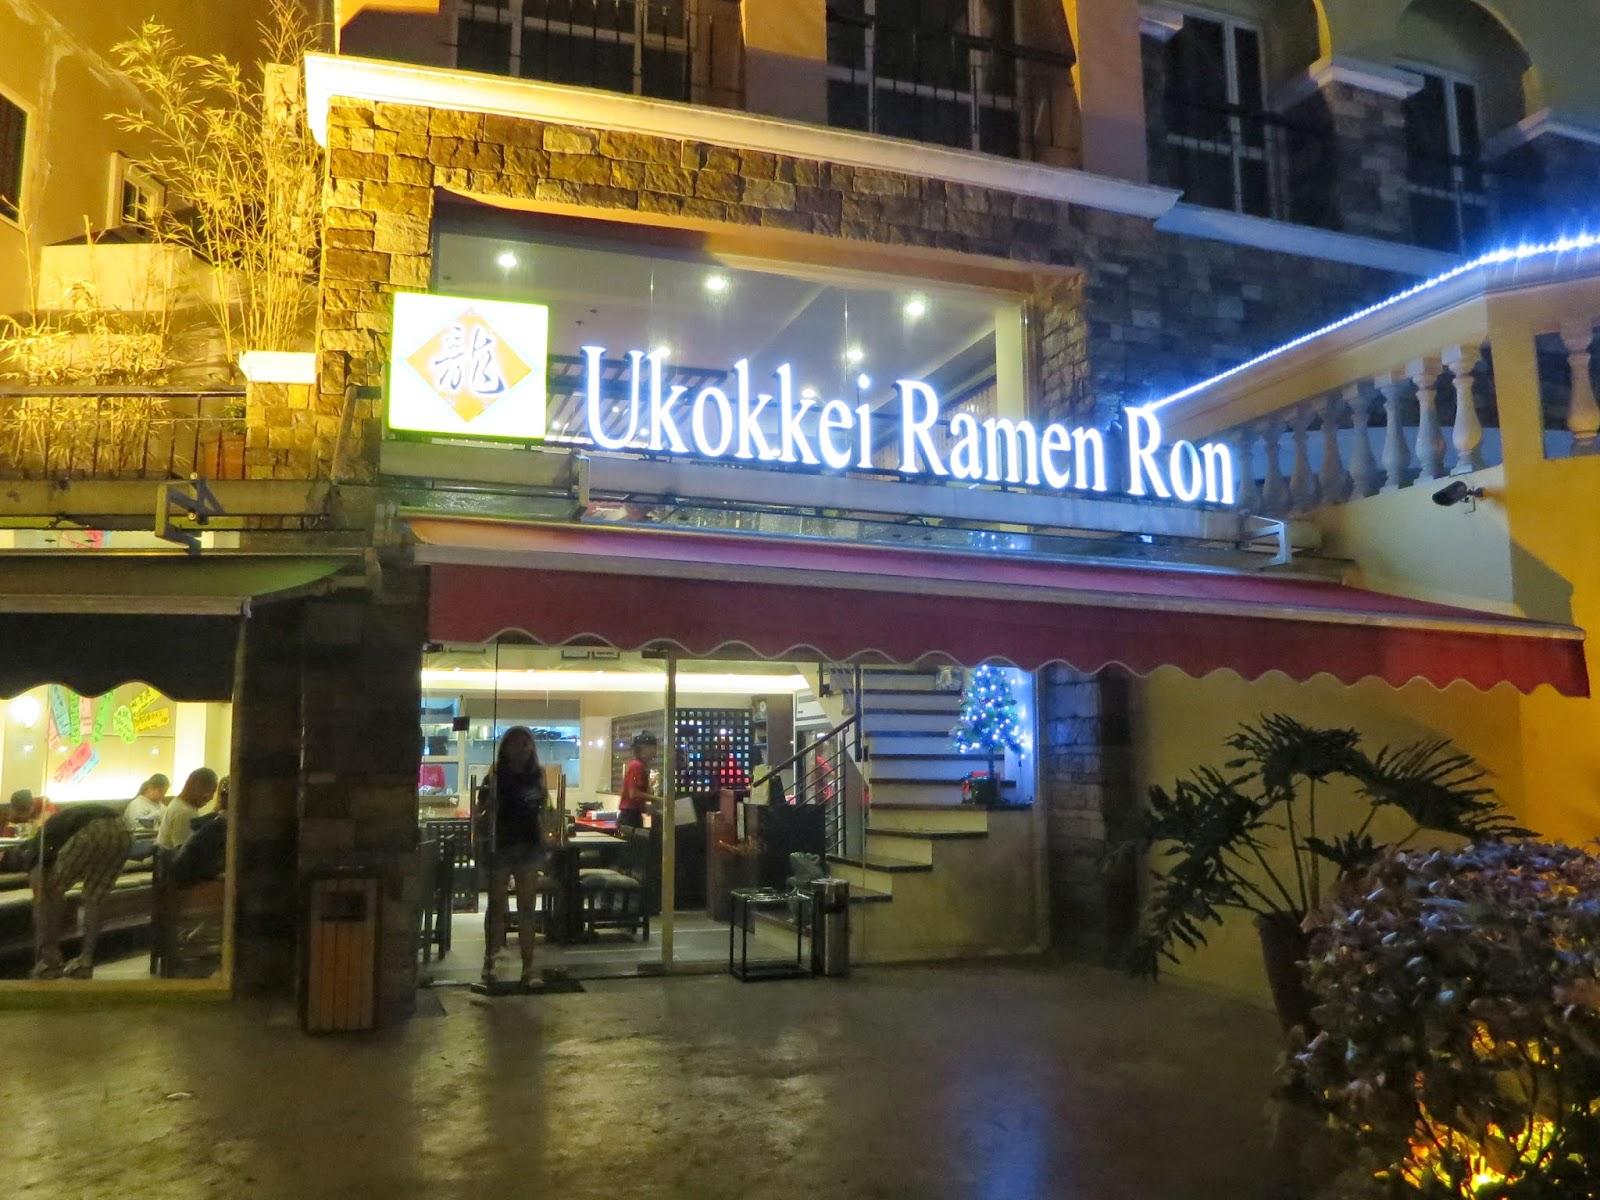 Ukkokei Ramen Ron and Bacolodian Friends